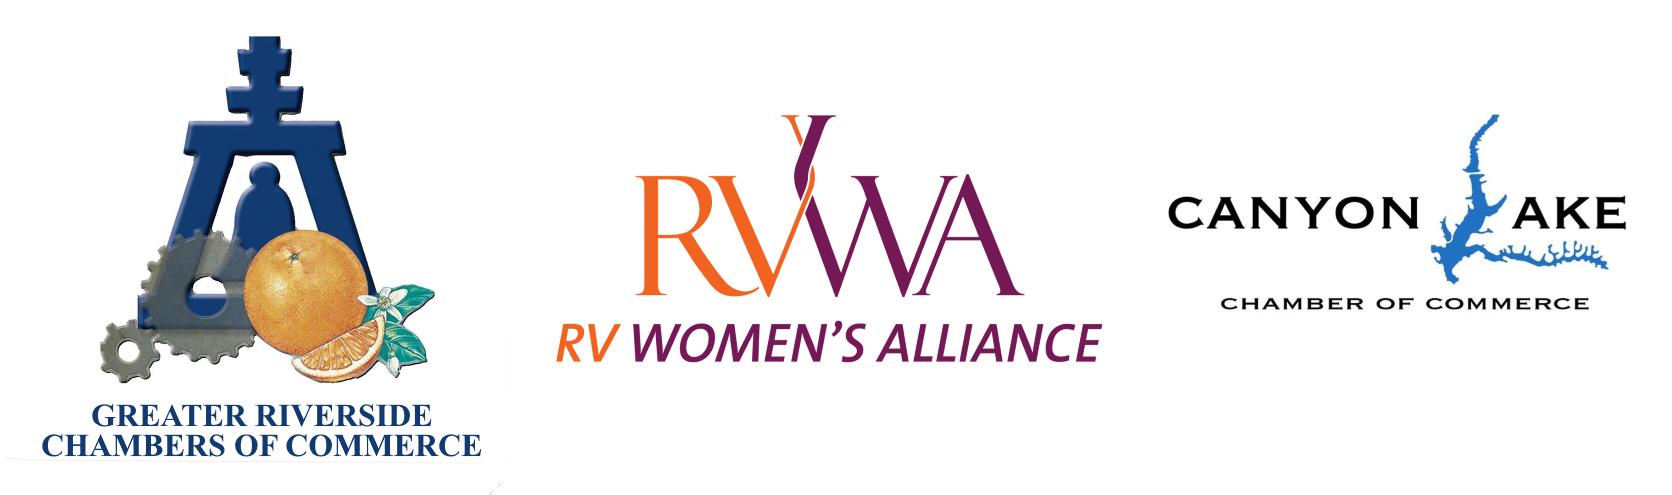 GRCOC and RVWA Membership Image